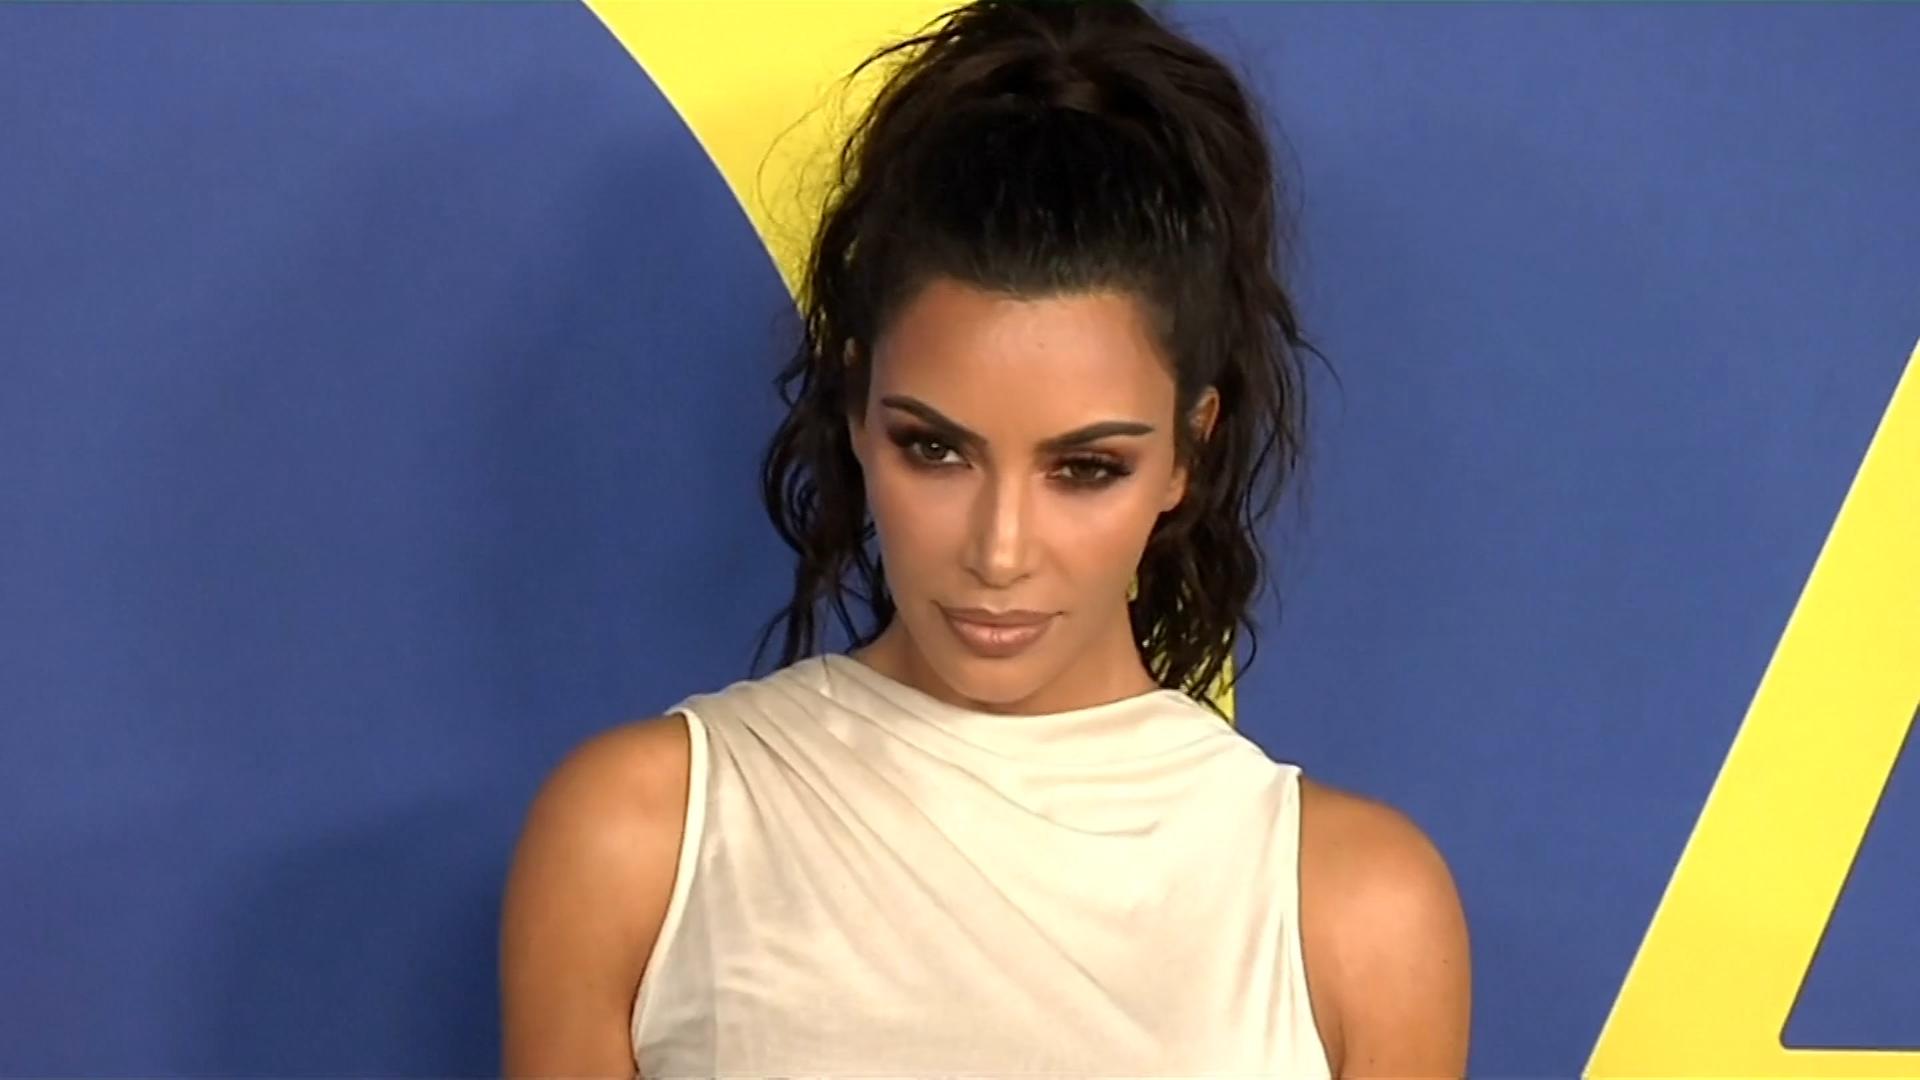 J.Lo gushes over Kourtney Kardashian's topless photo